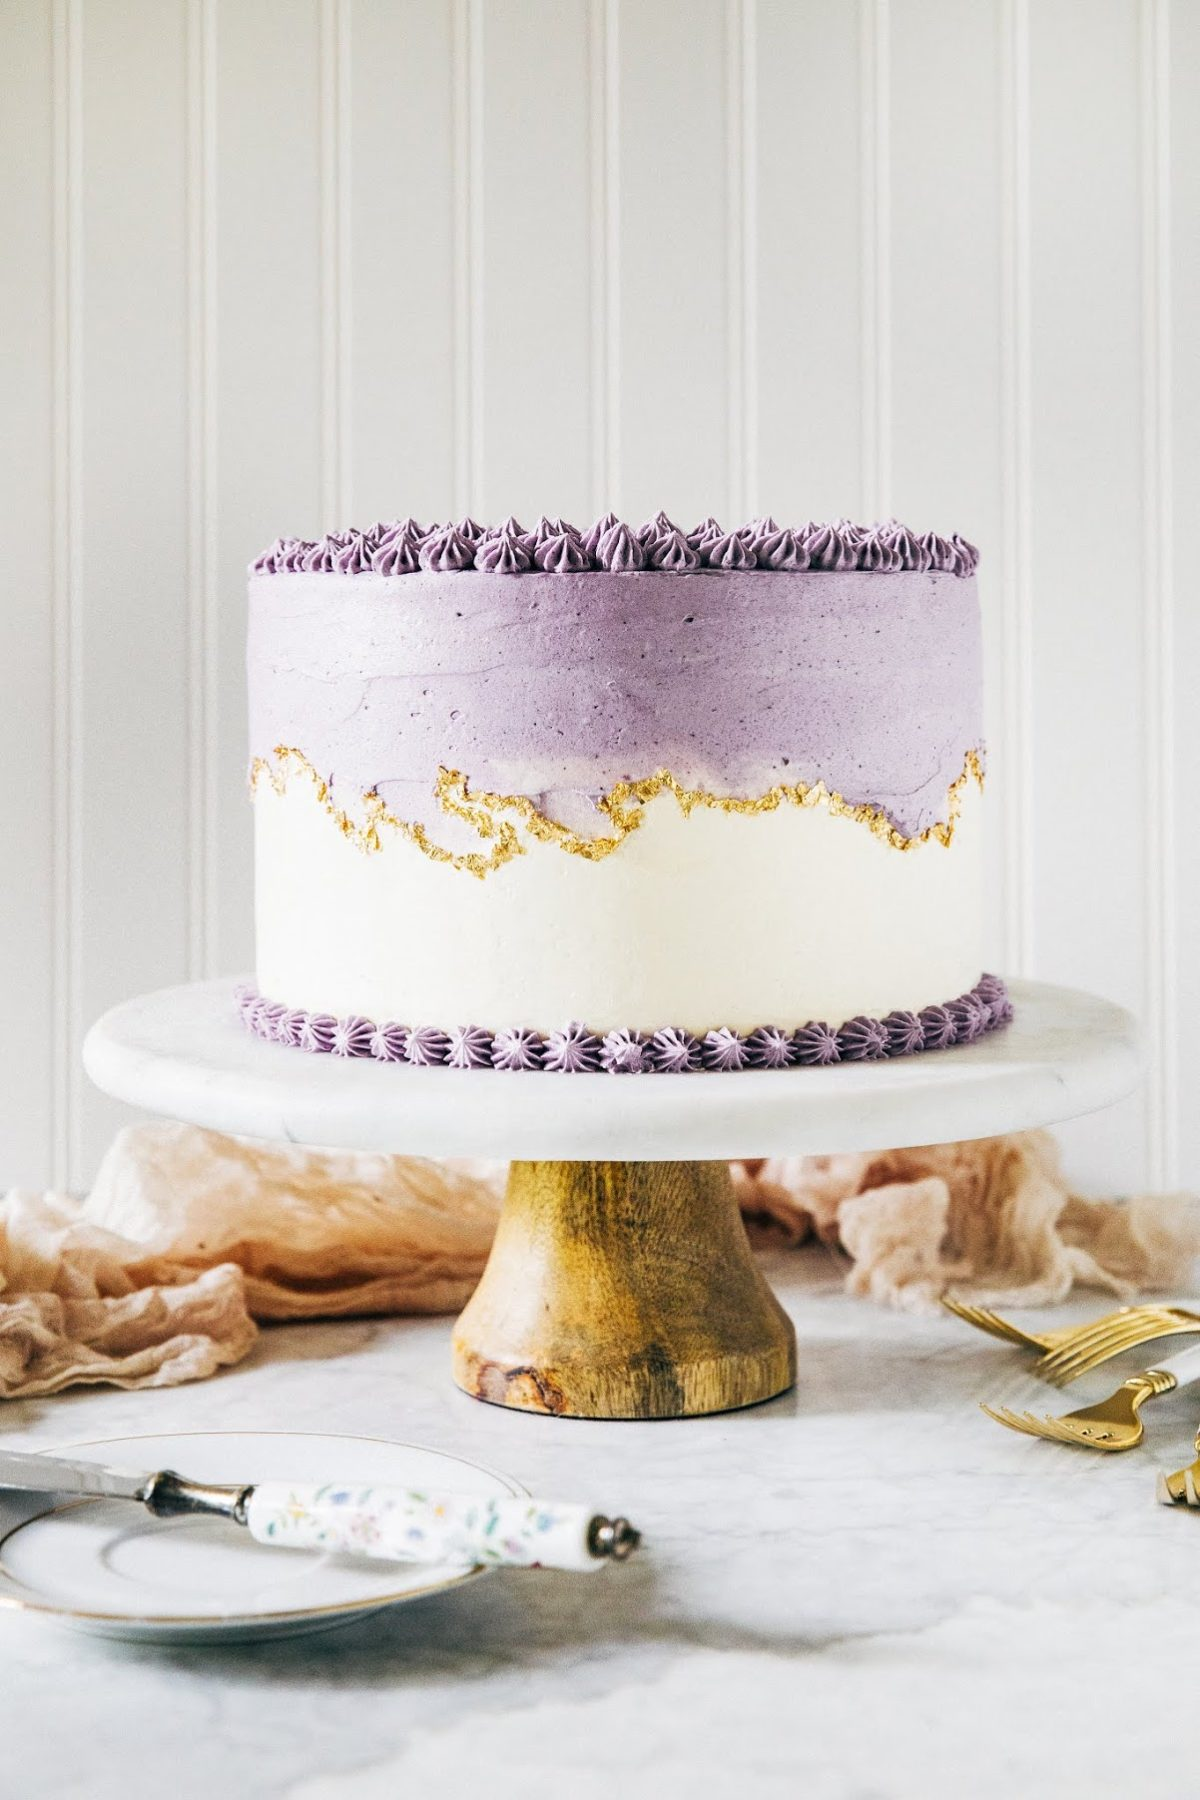 Astounding Ube Layer Cake Seven Years Of Hummingbird High Hummingbird High Funny Birthday Cards Online Kookostrdamsfinfo